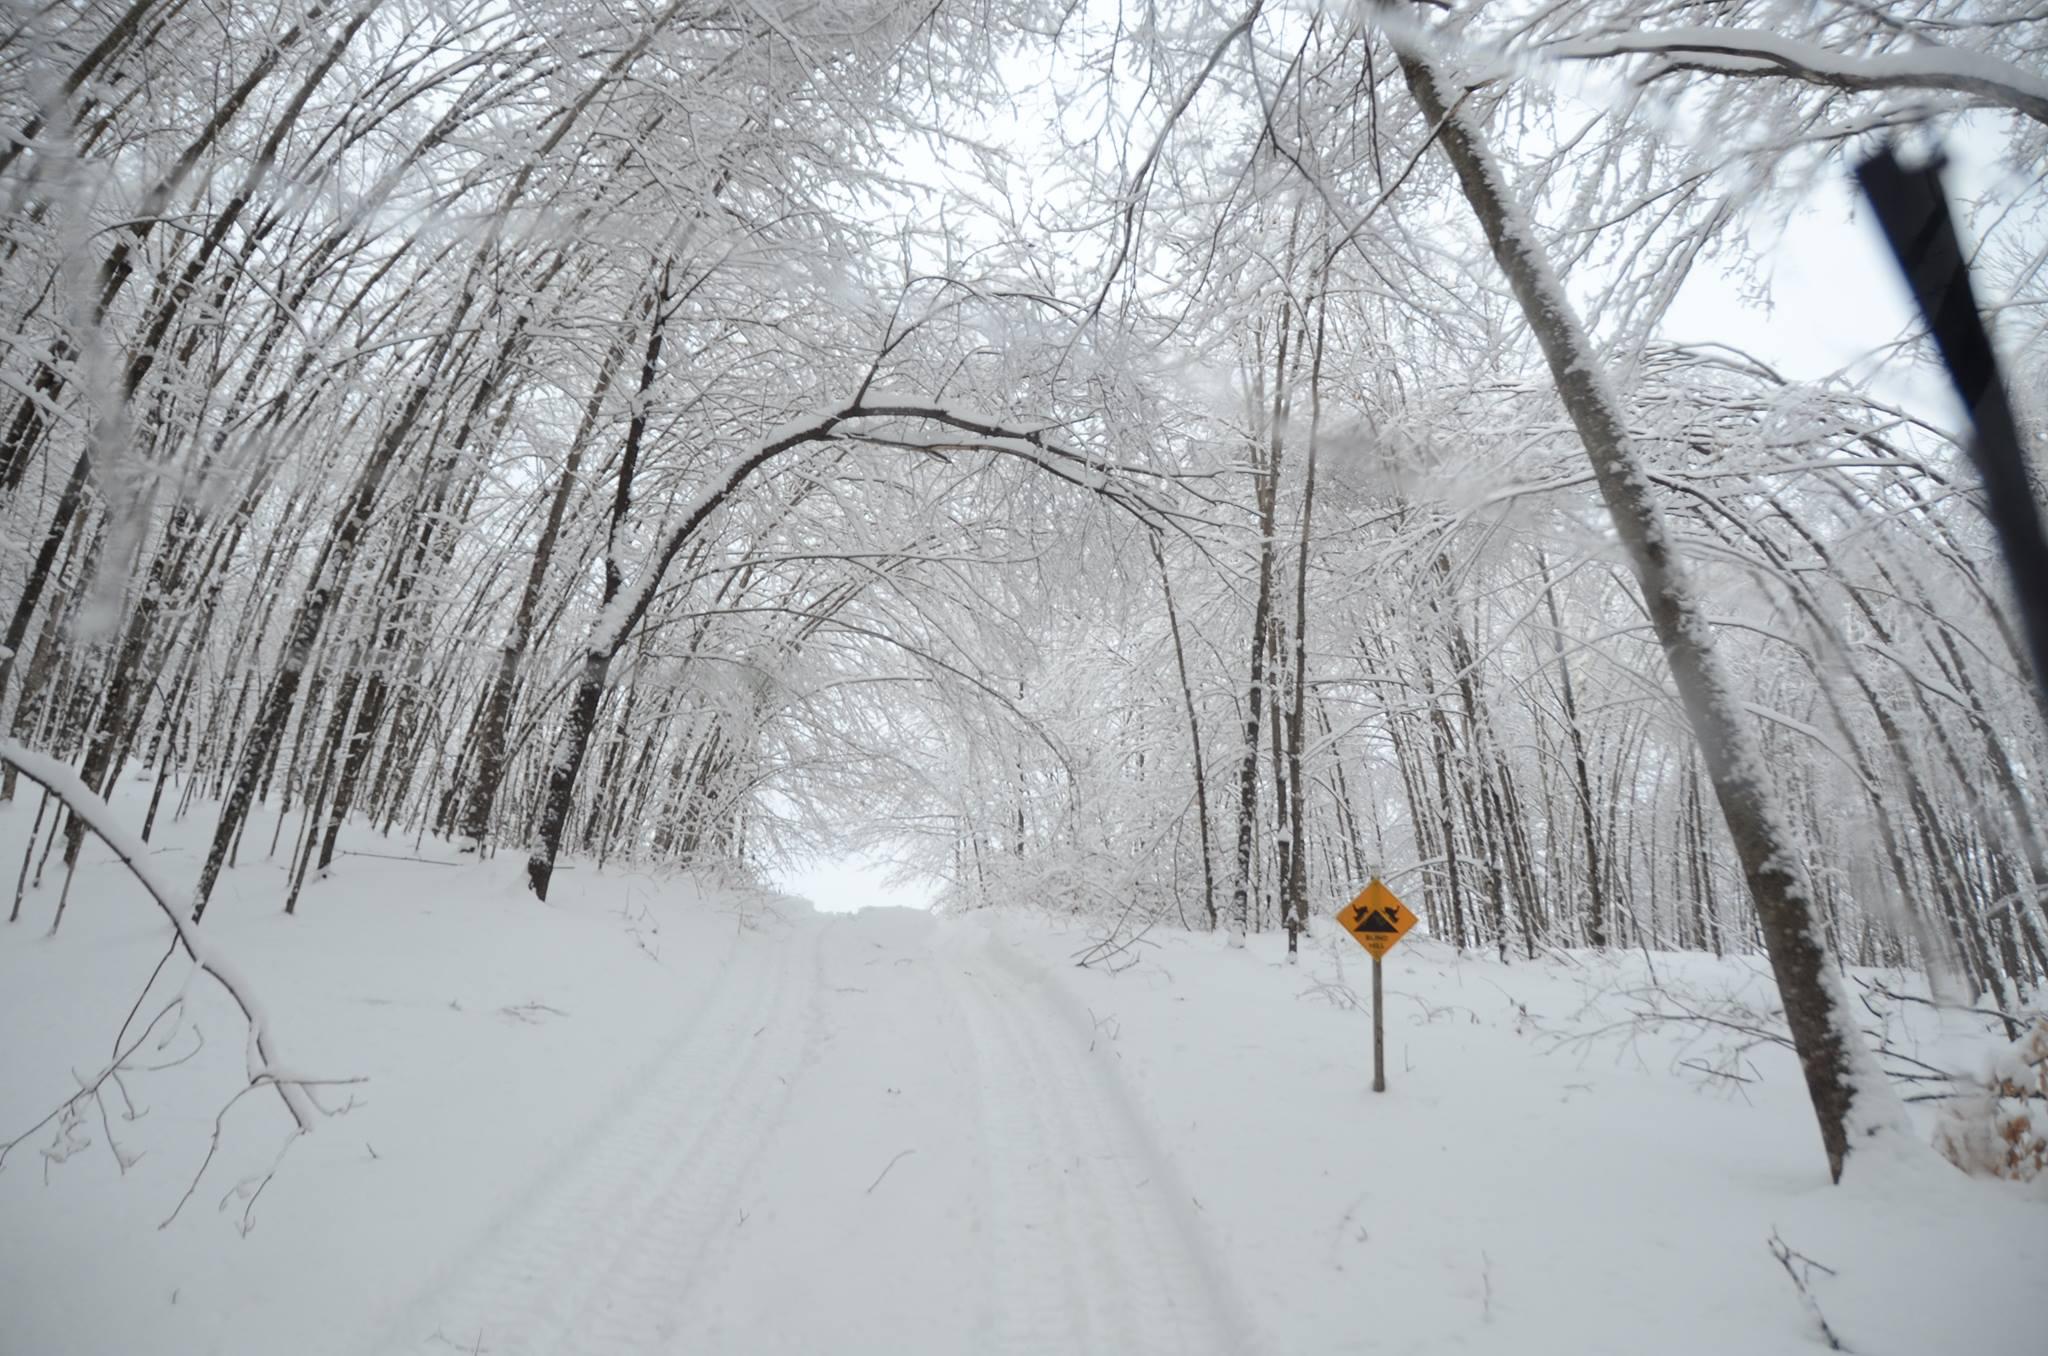 Vermont ociation of Snow Travelers (VAST) | Visit Island Pond on